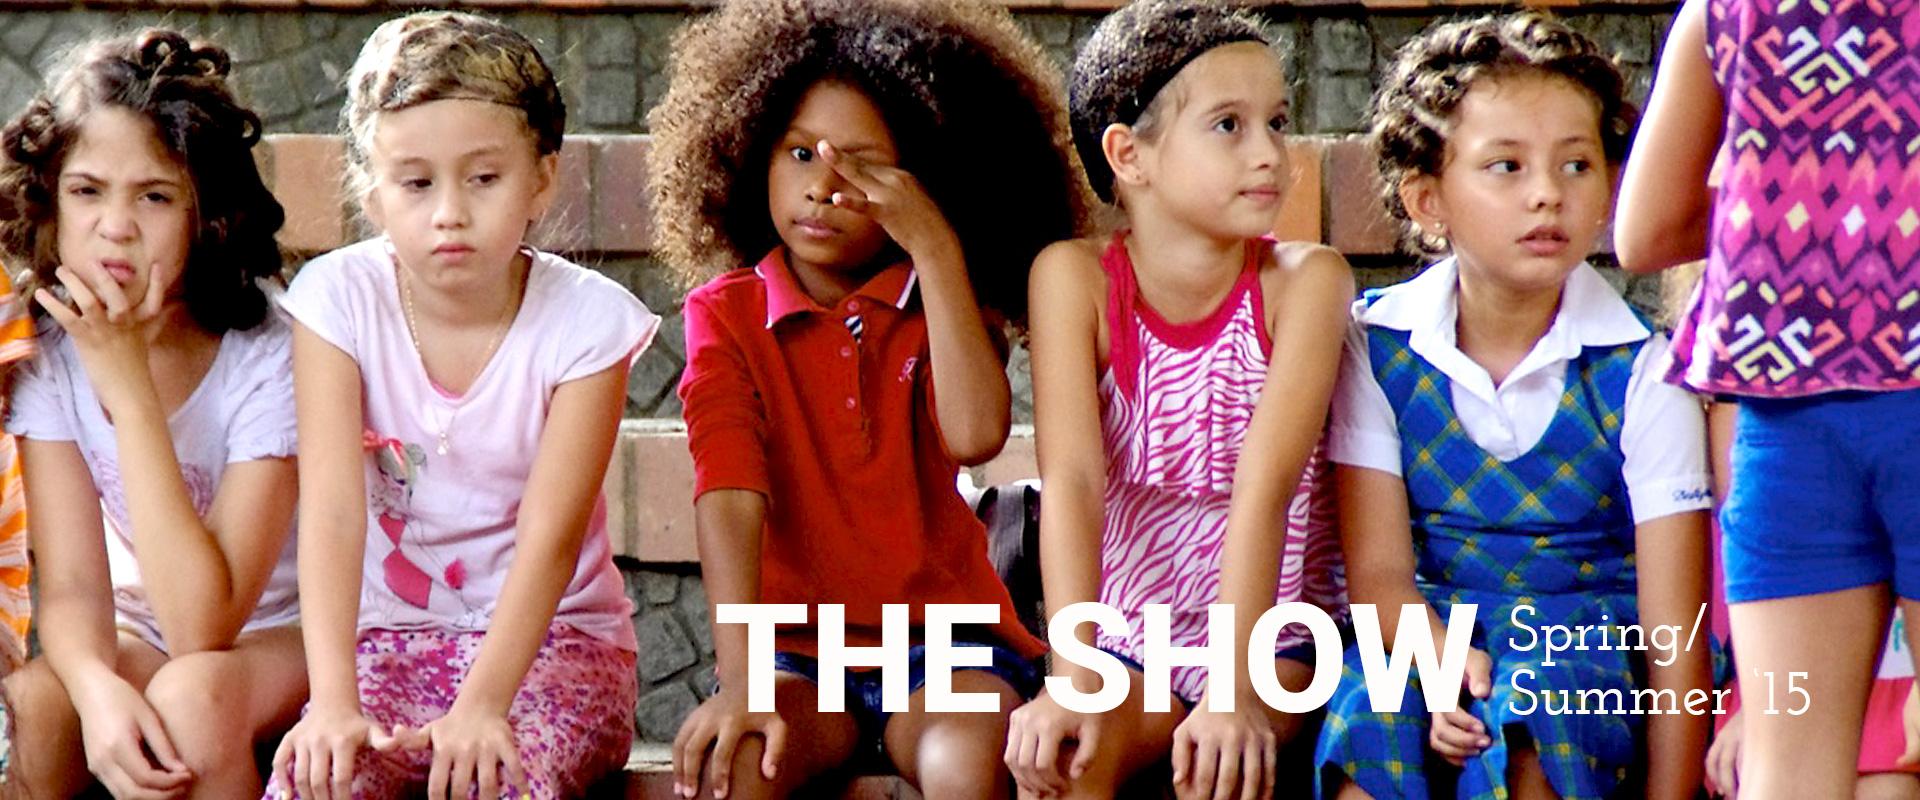 Titel: the show